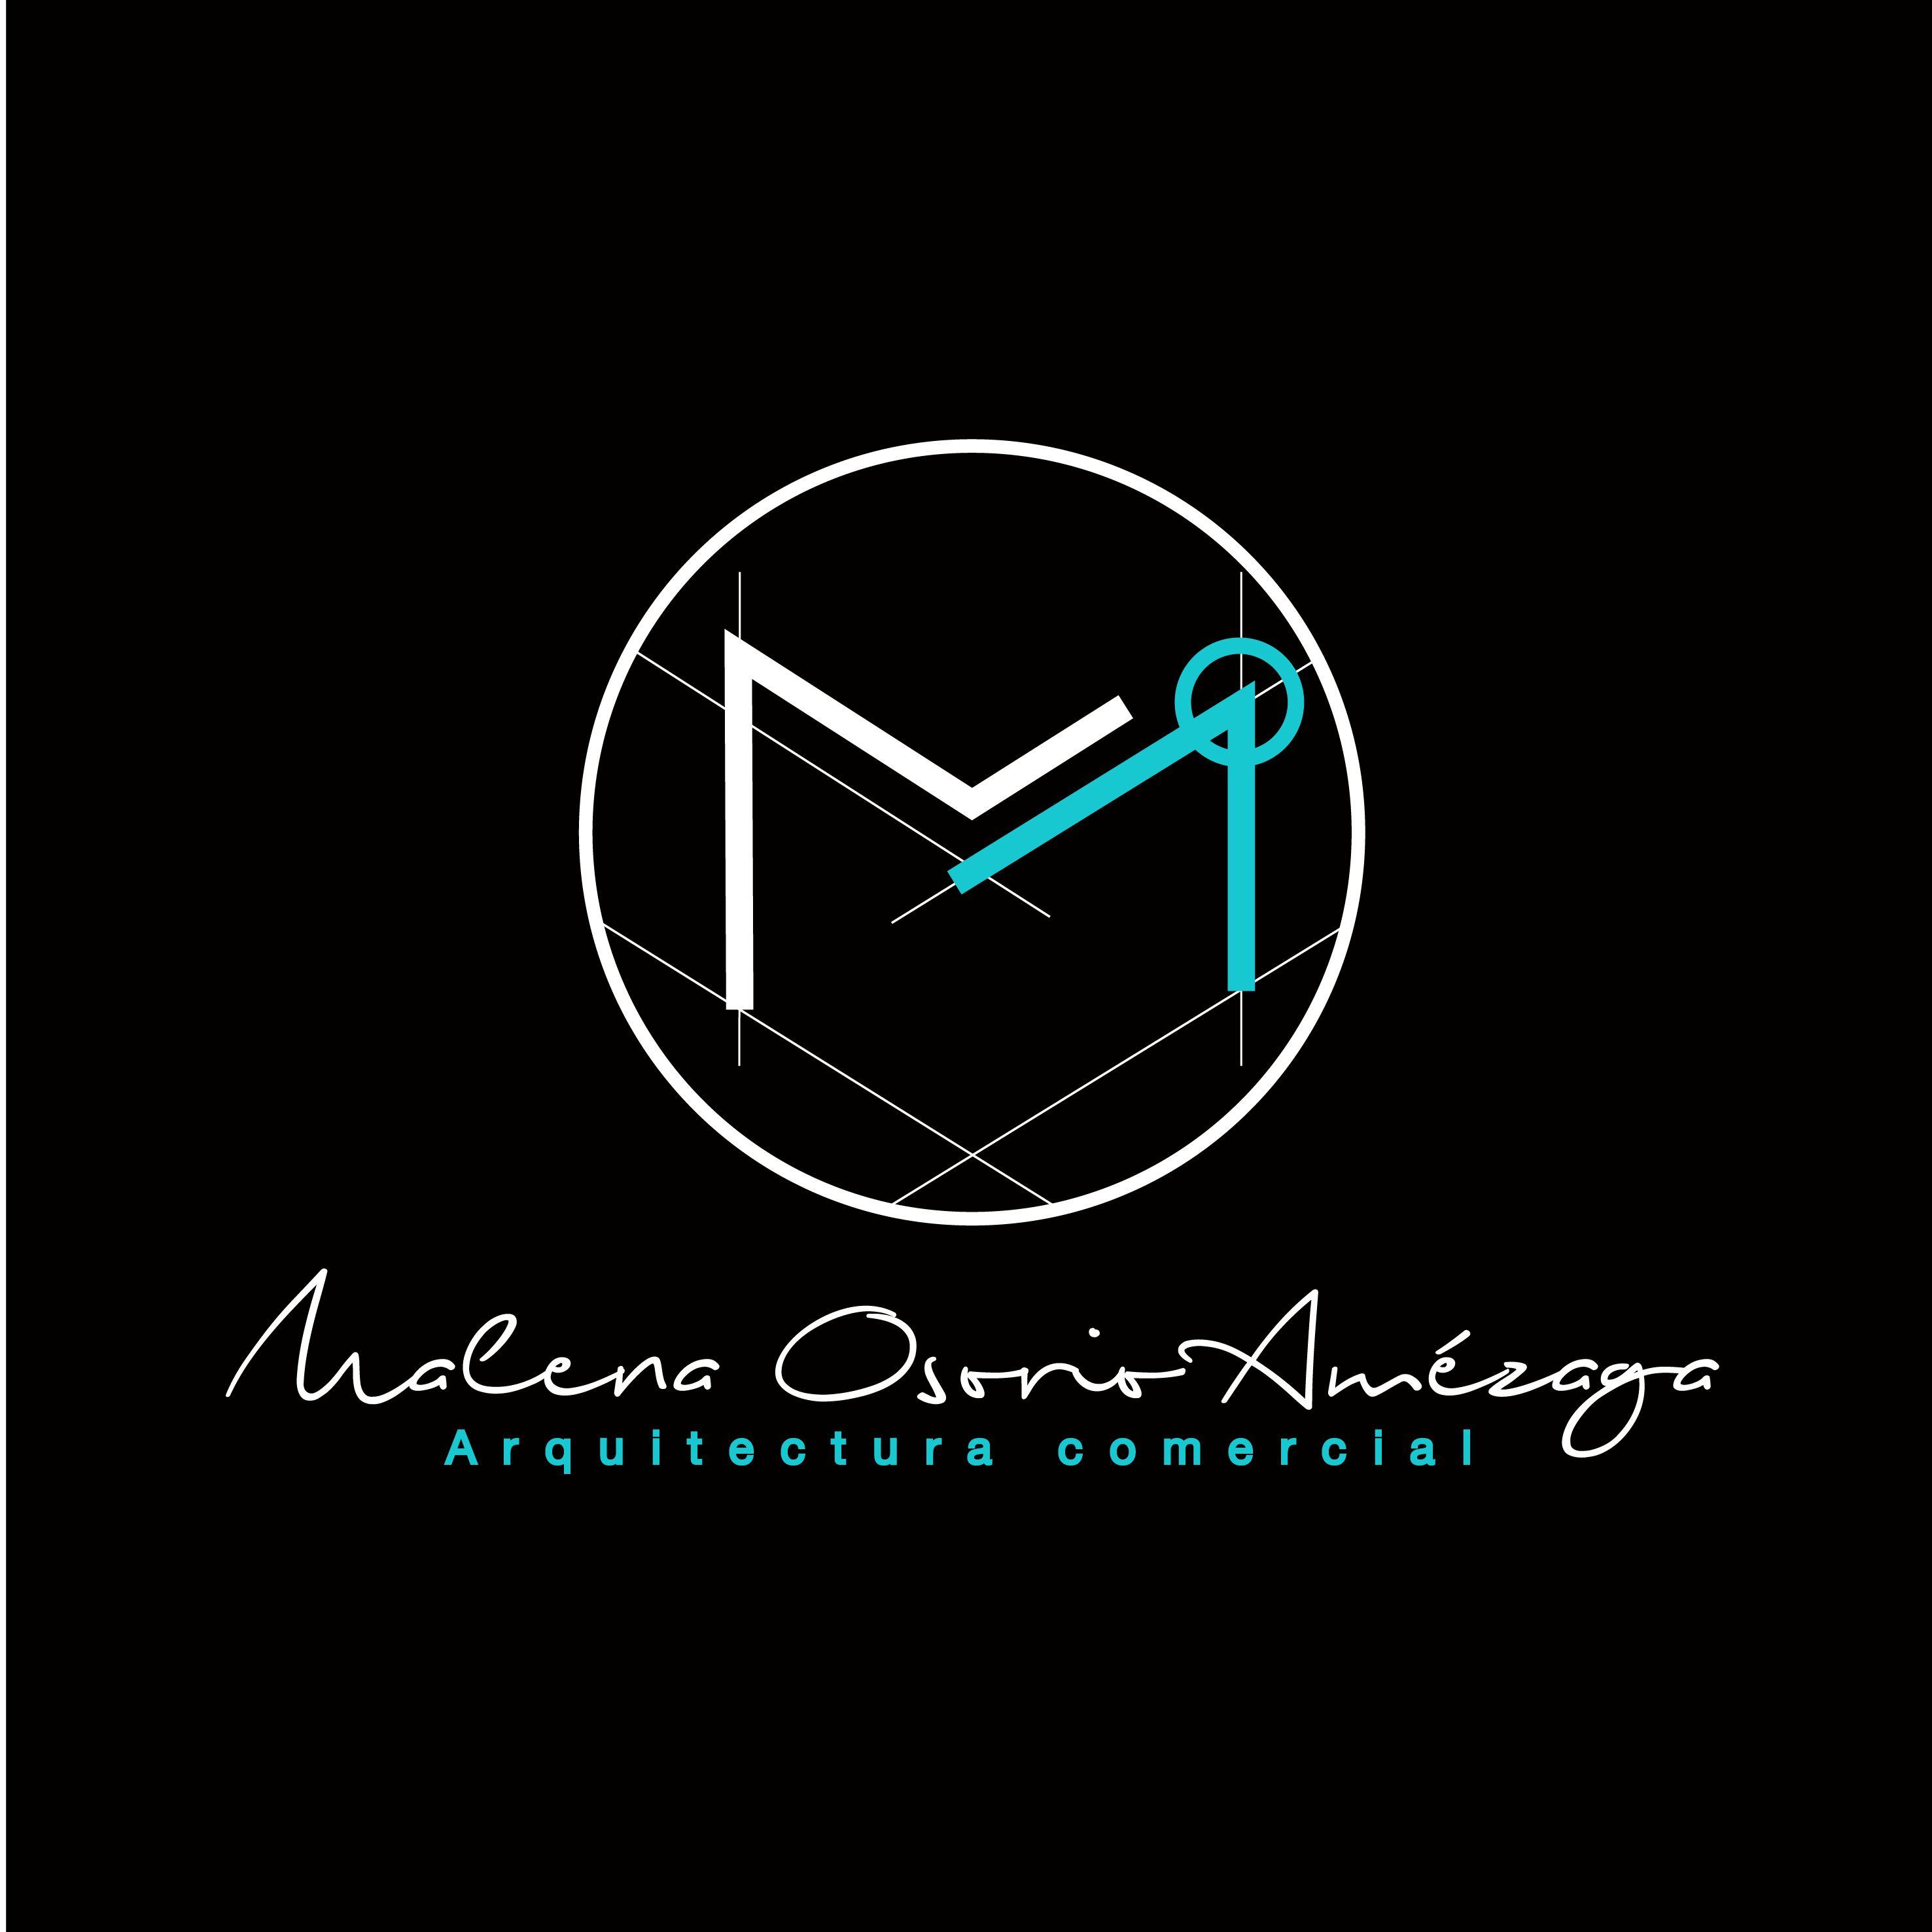 logo arquitectura negro logos pinterest negro y On logos de despachos de arquitectura